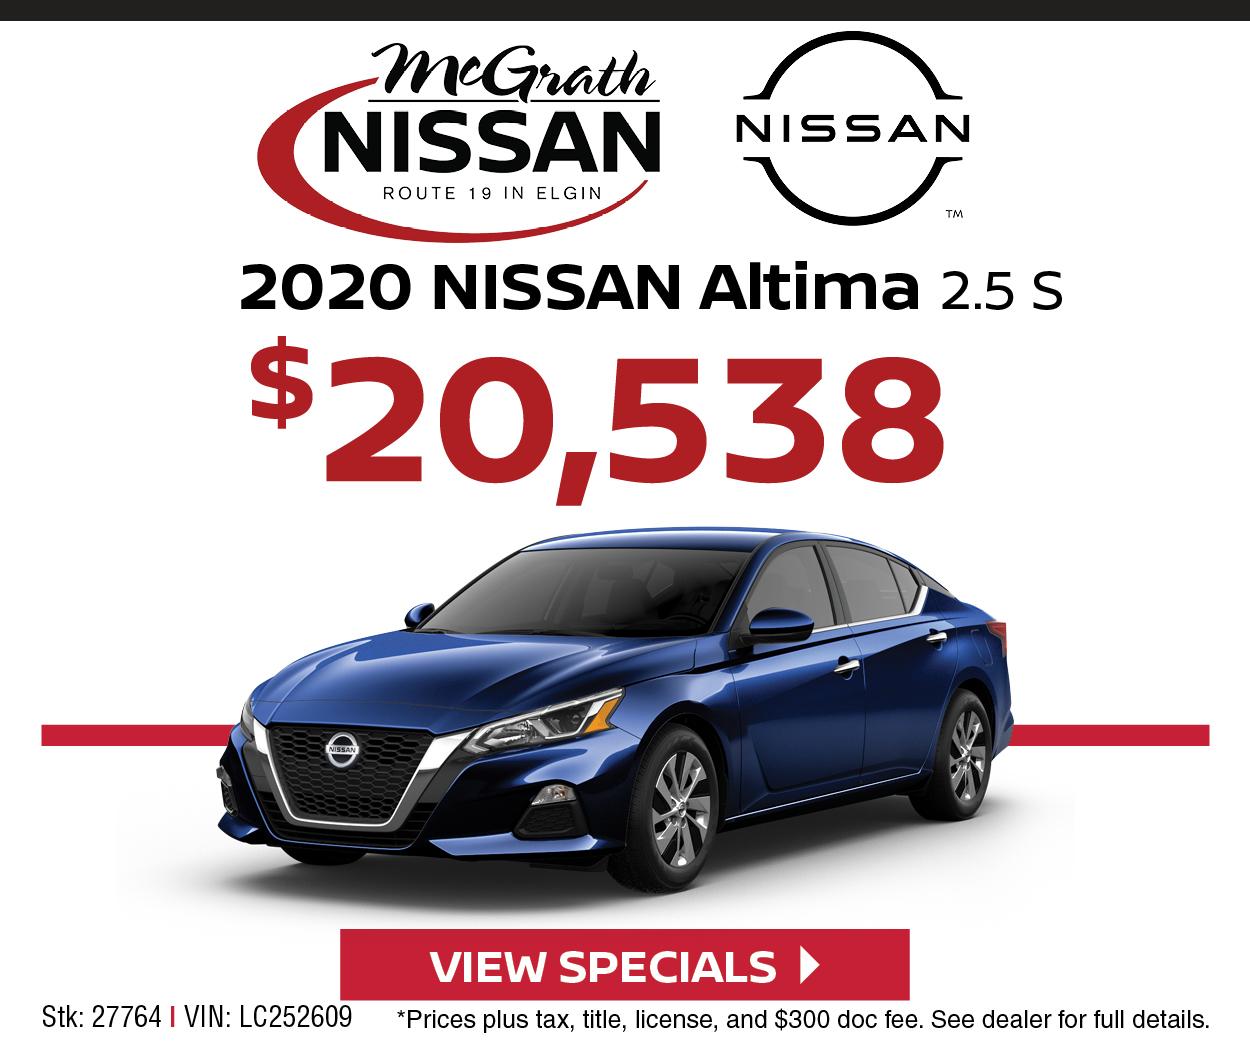 2020 Nissan Altima 2.5S - $20,538